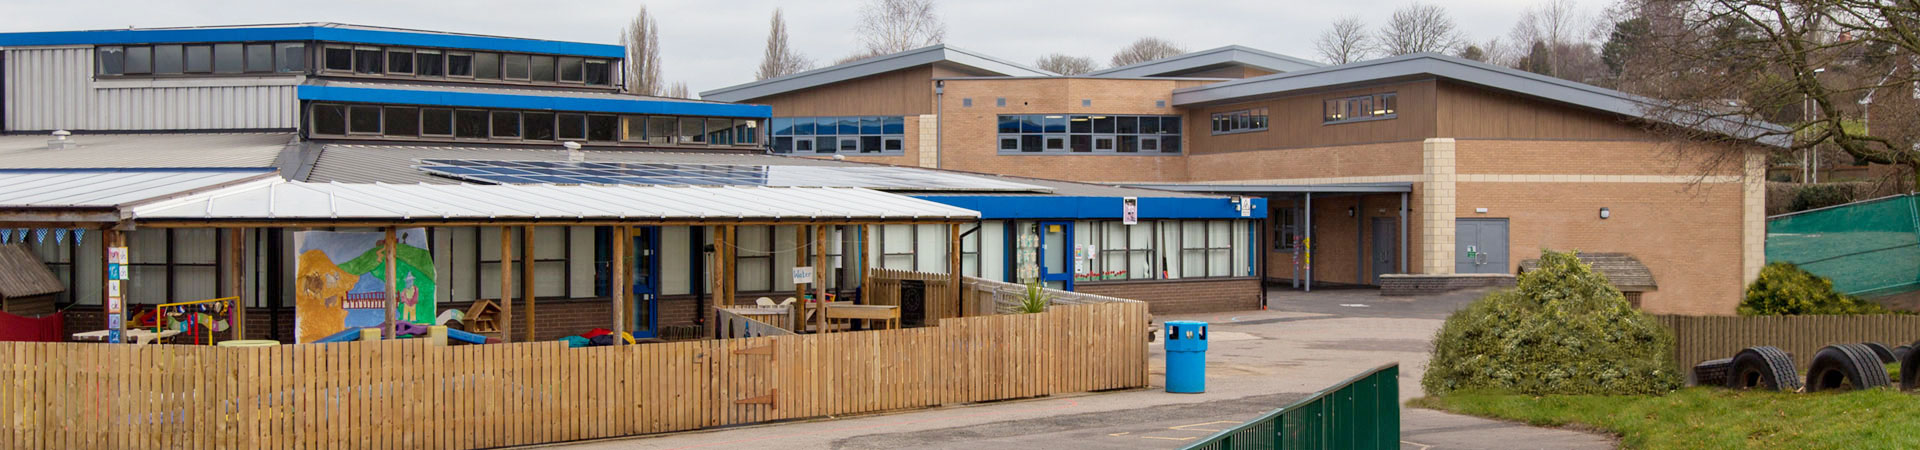 Winnington Park Primary School & Nursery, Northwich